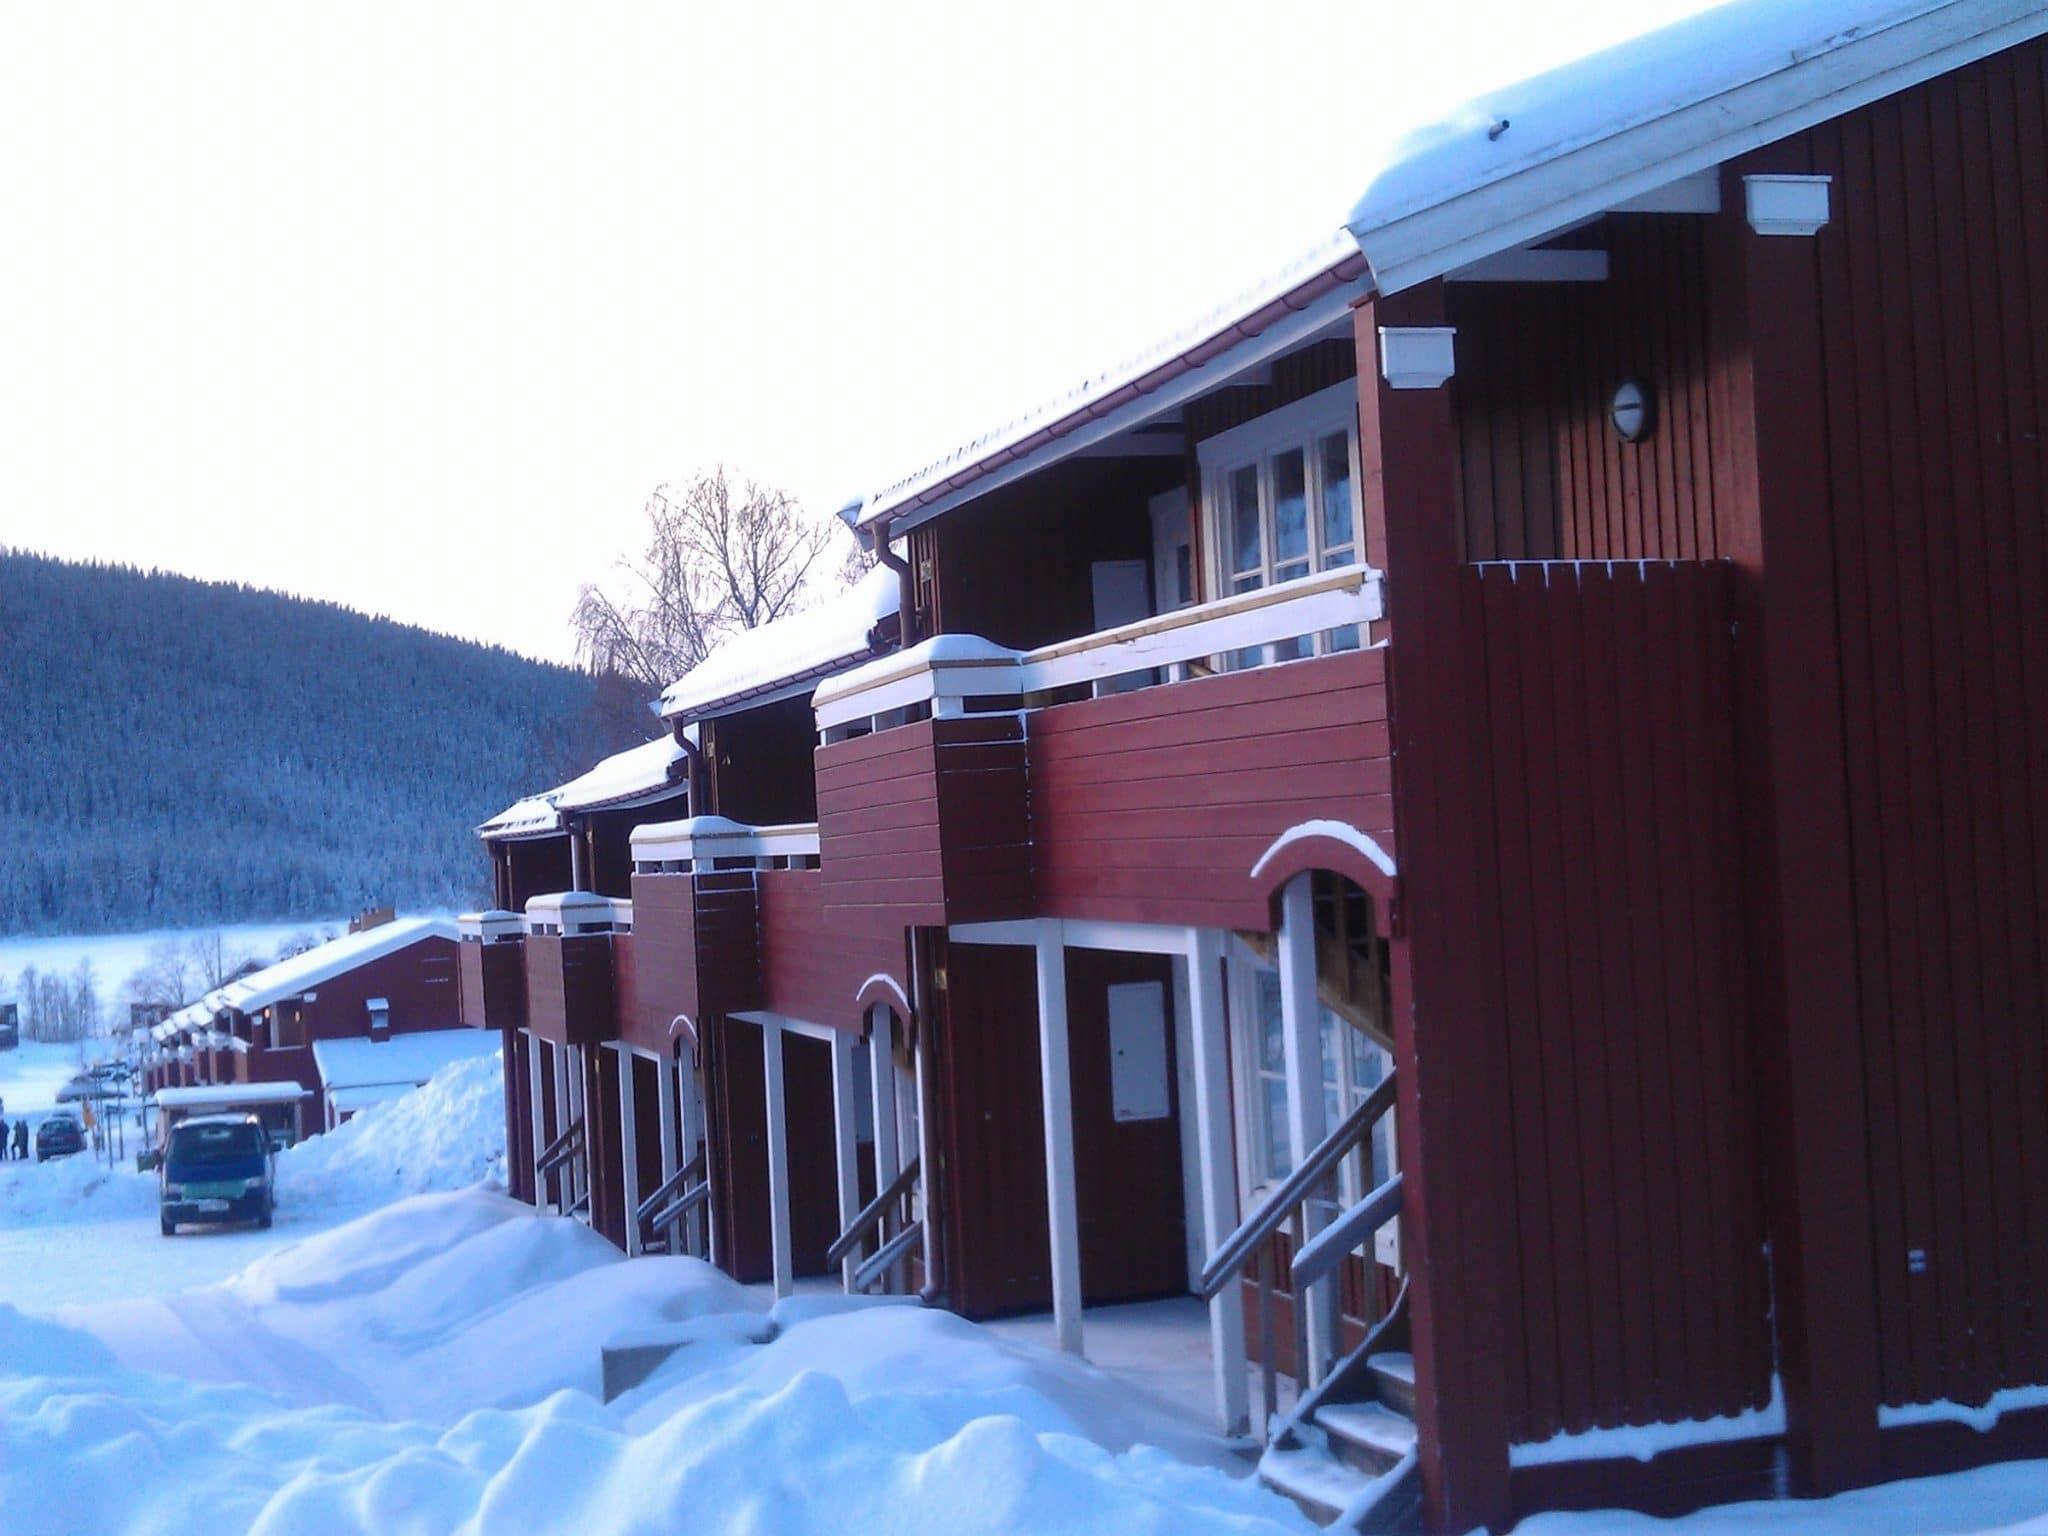 Torvtaket in Åre in winter